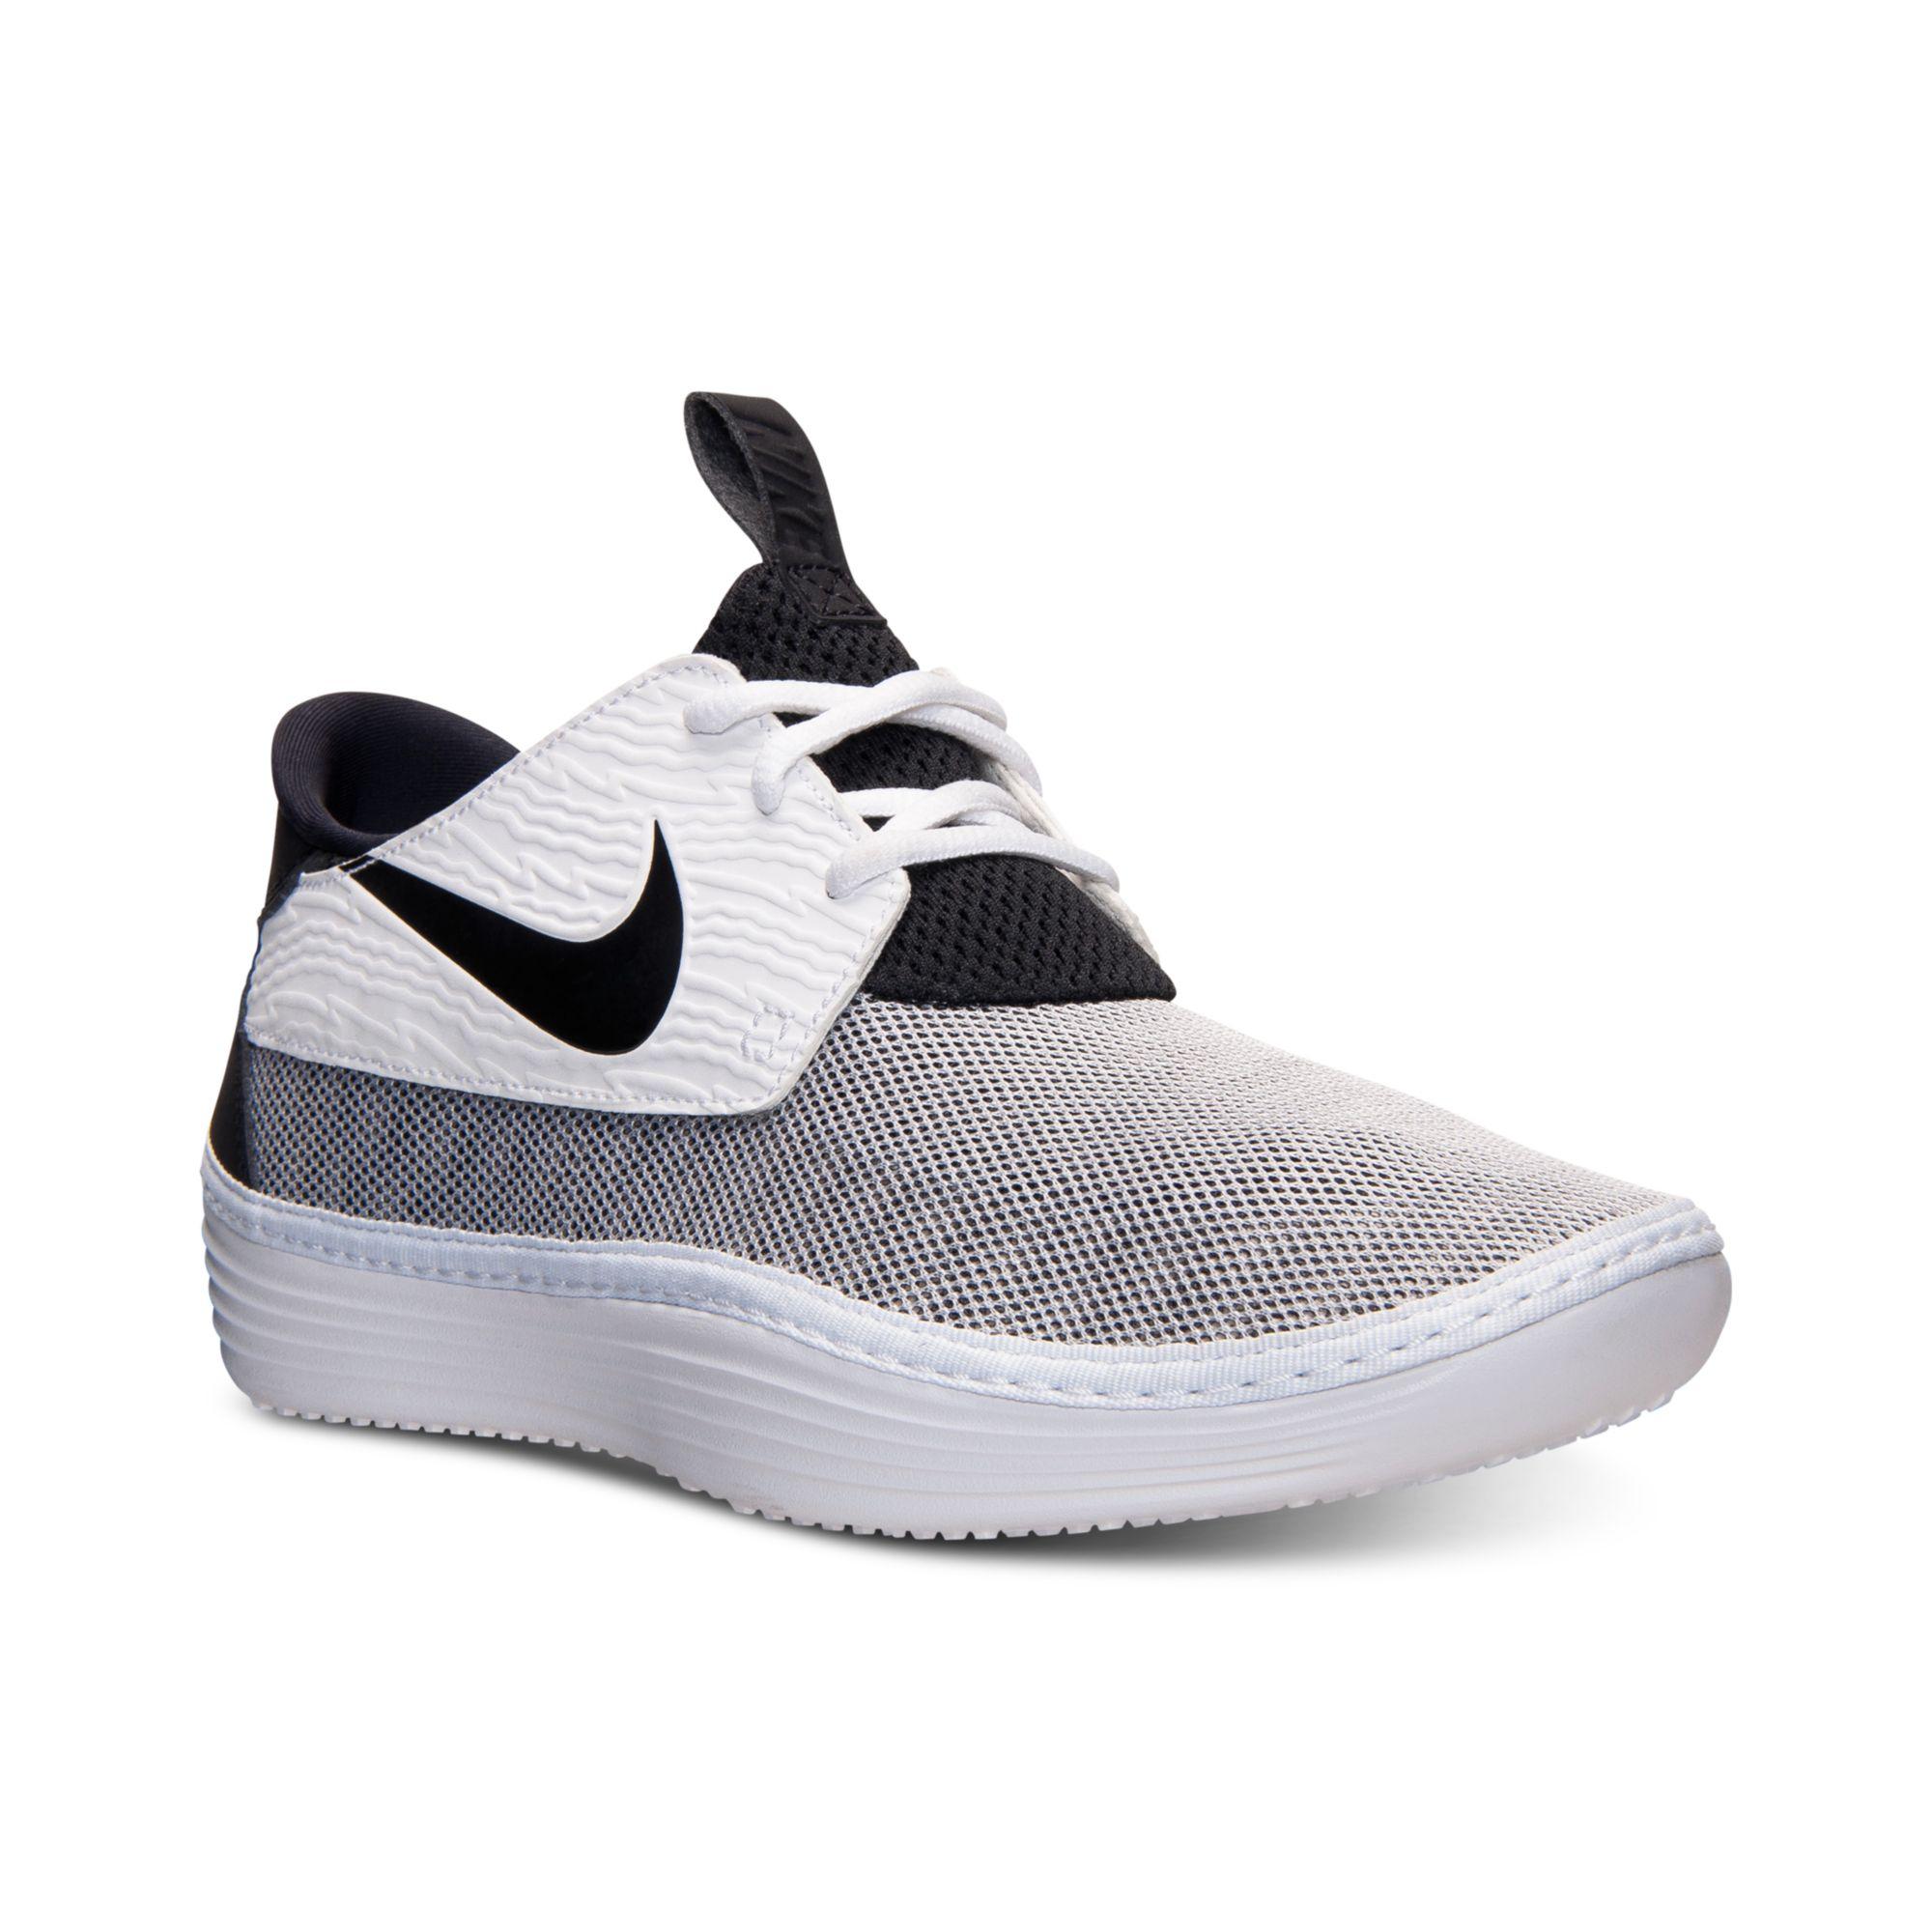 Steven Alan Nike Shoes